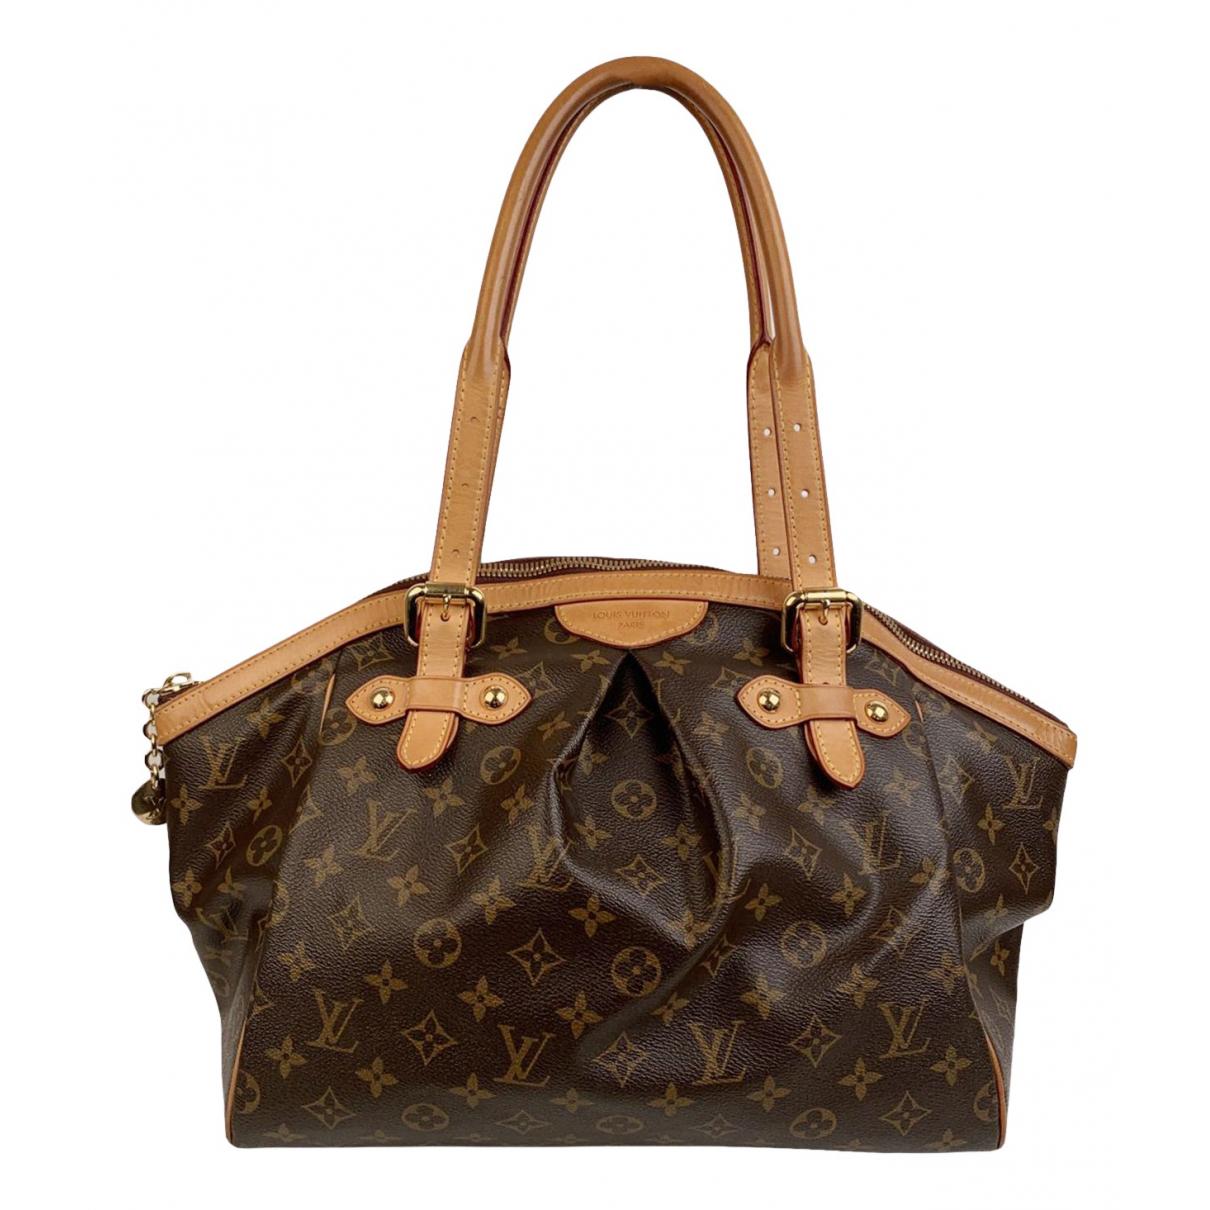 Louis Vuitton - Sac a main Tivoli pour femme en toile - marron